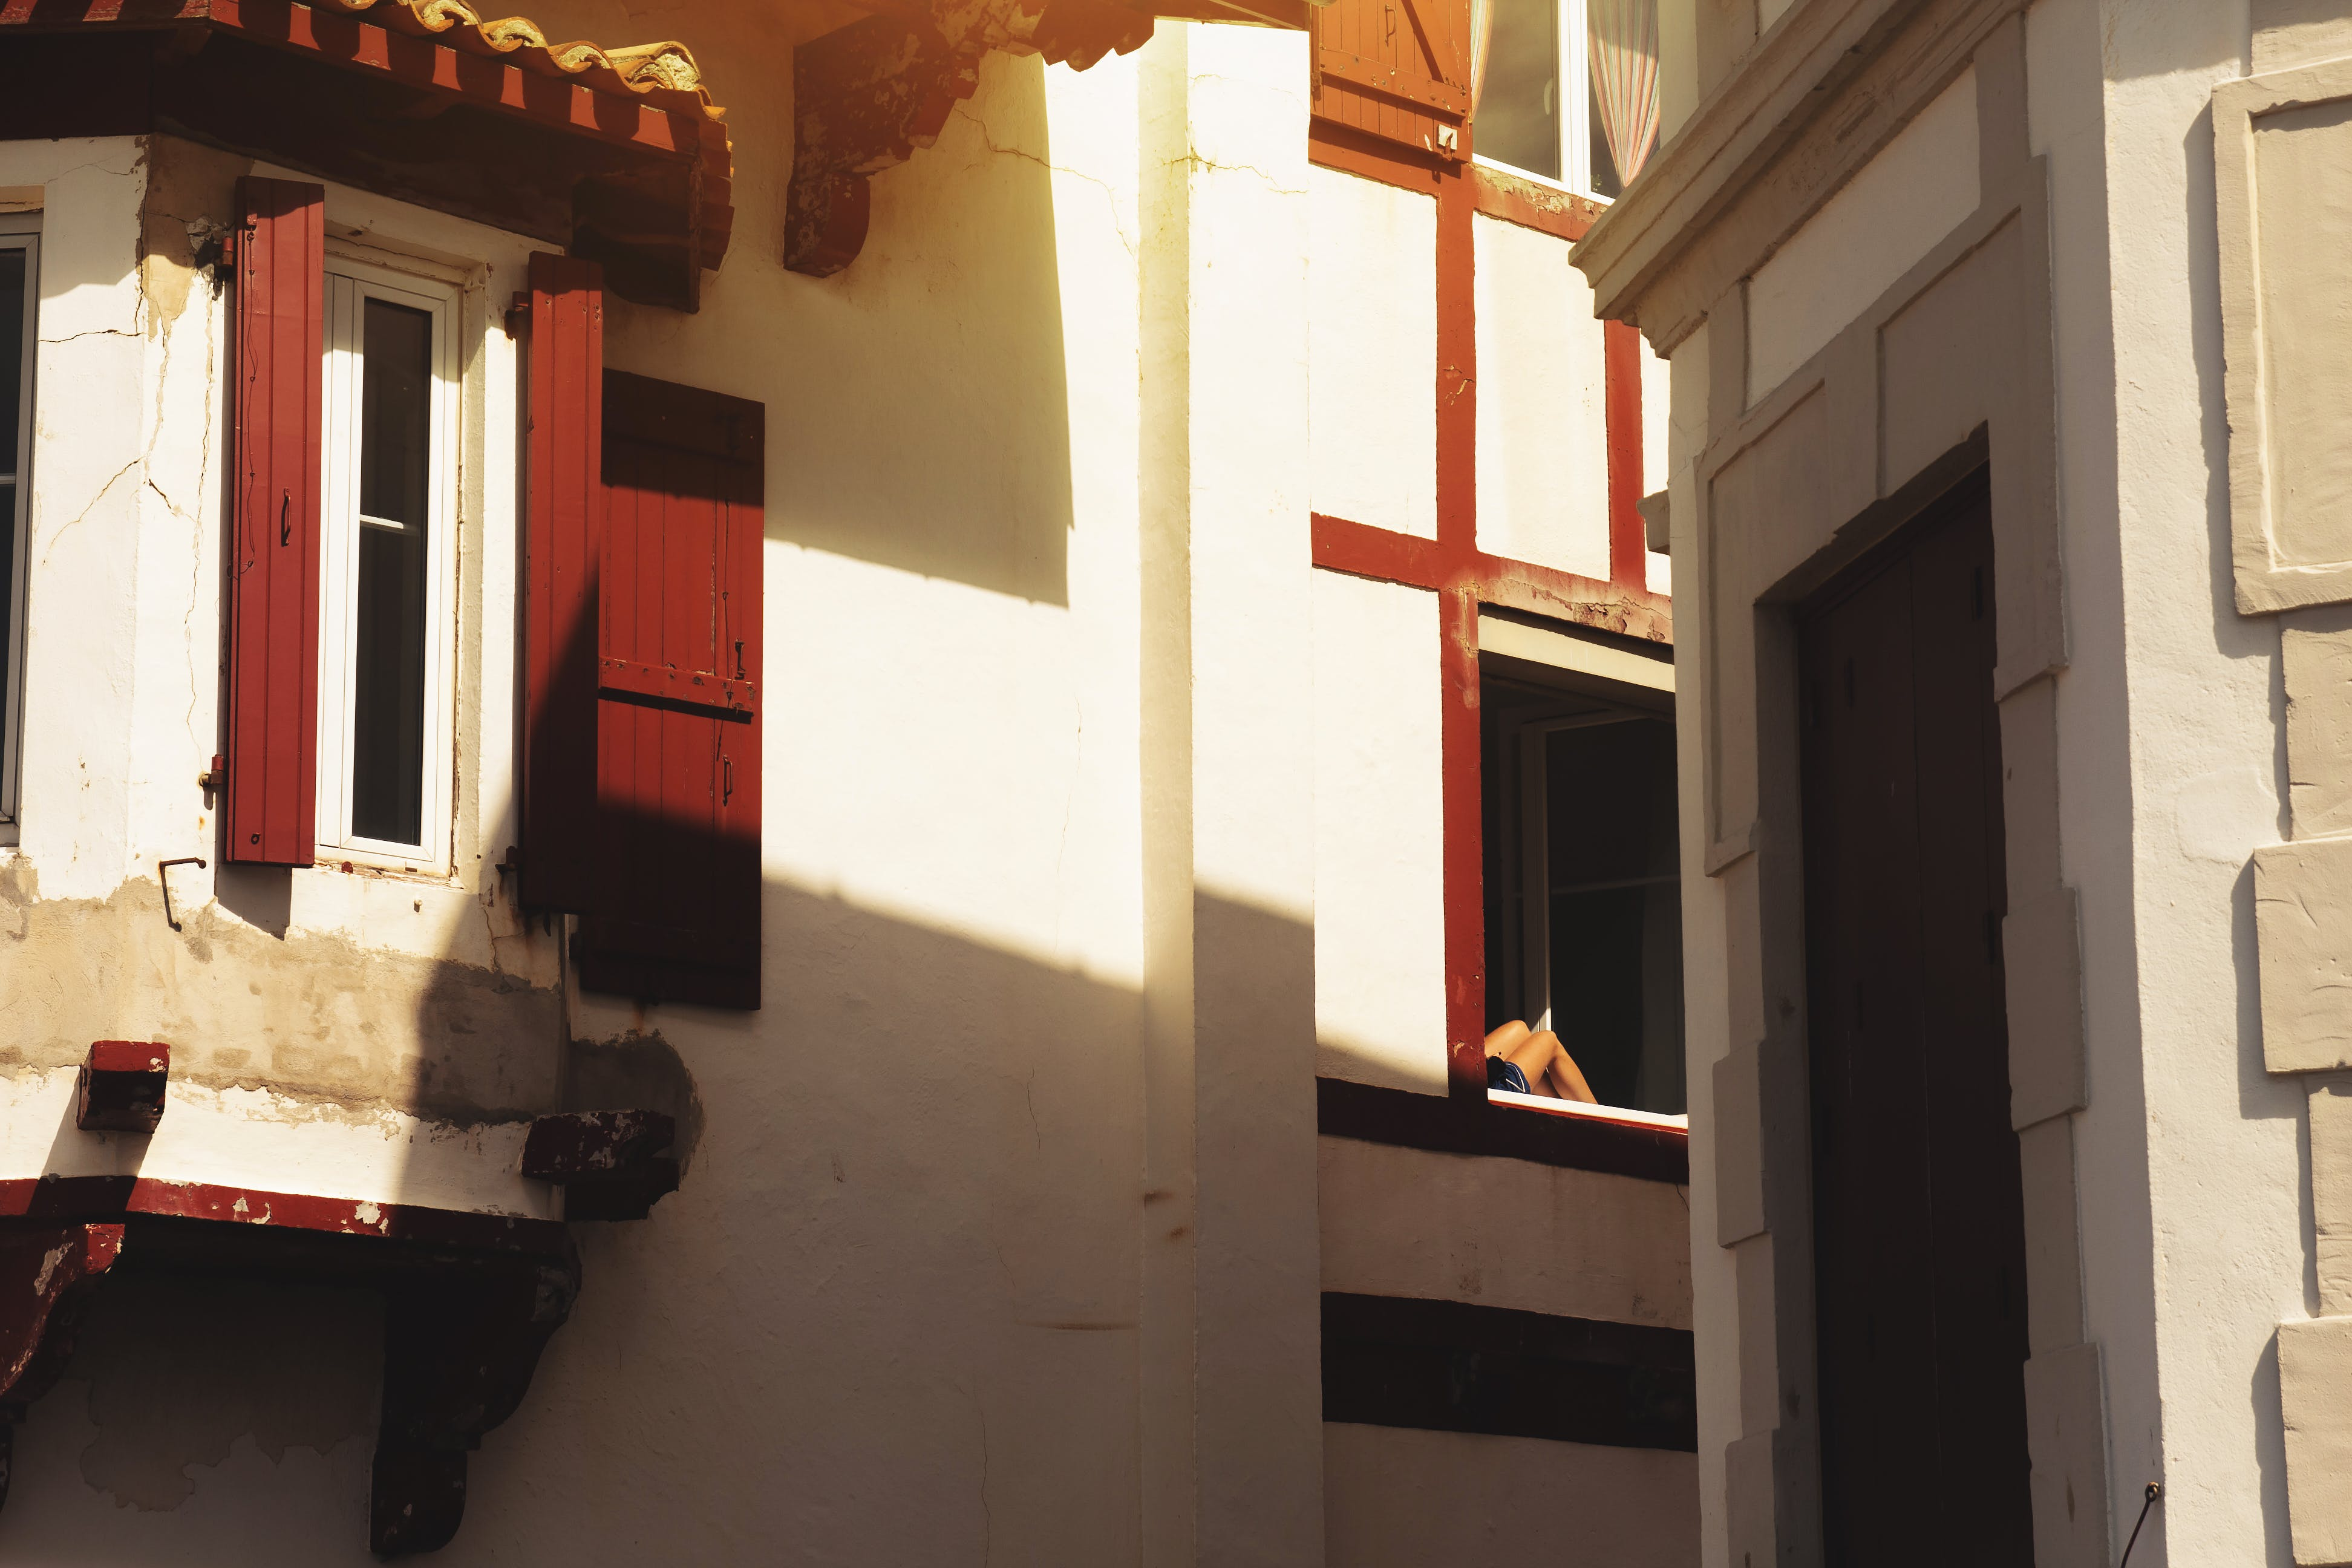 Free stock photo of windows, structure, facade, sunlight